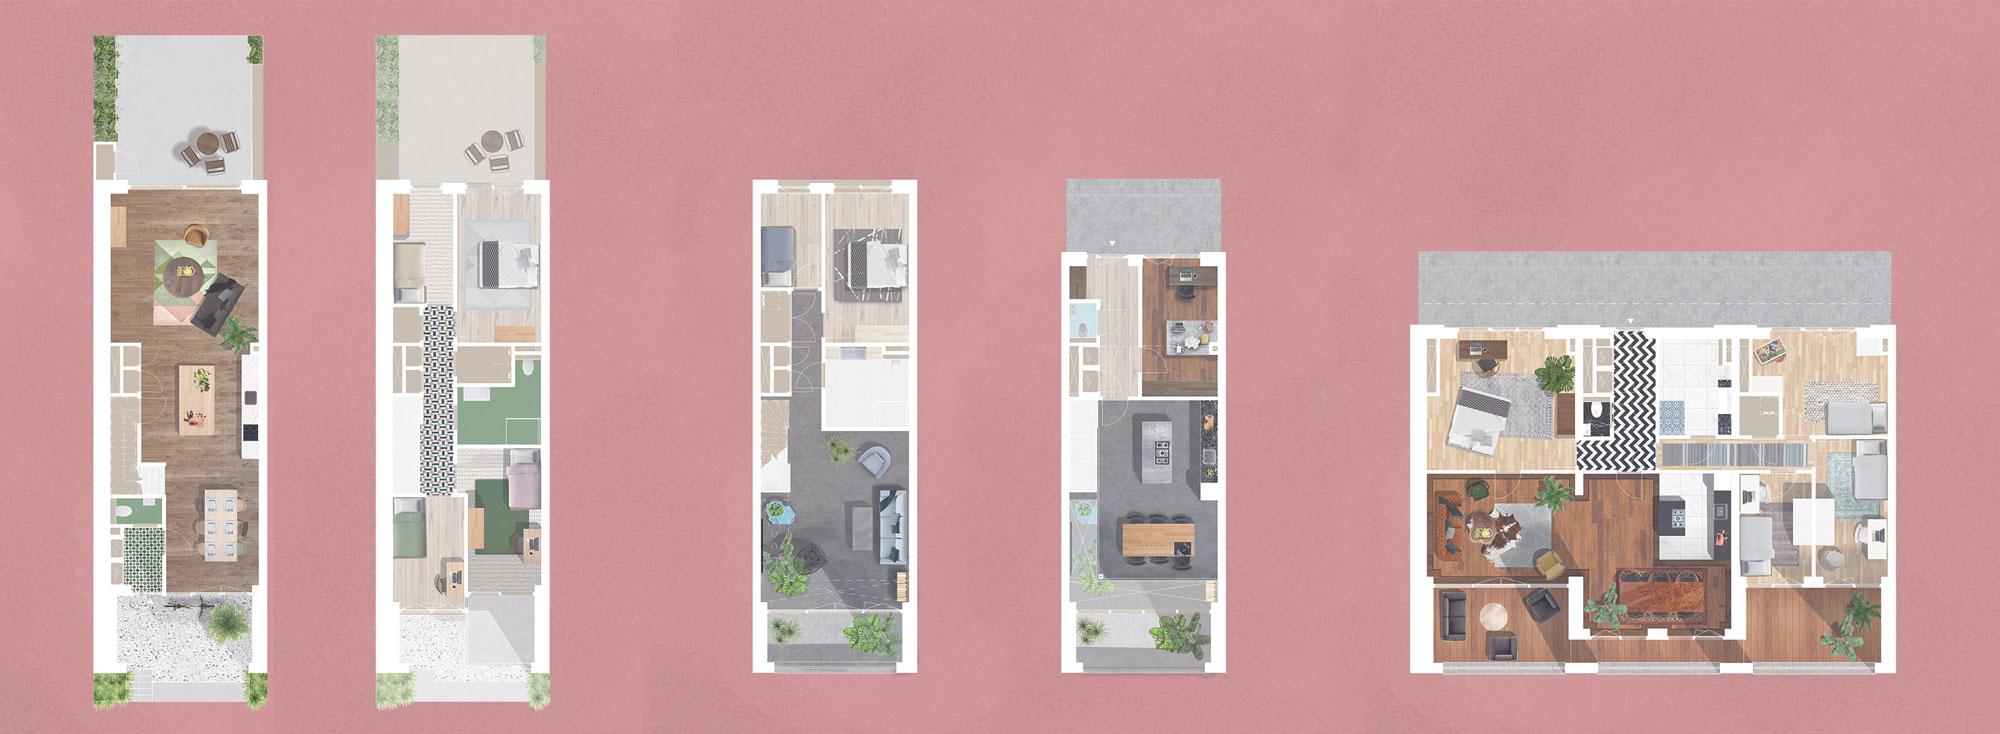 lloydpier-architectuur-maken